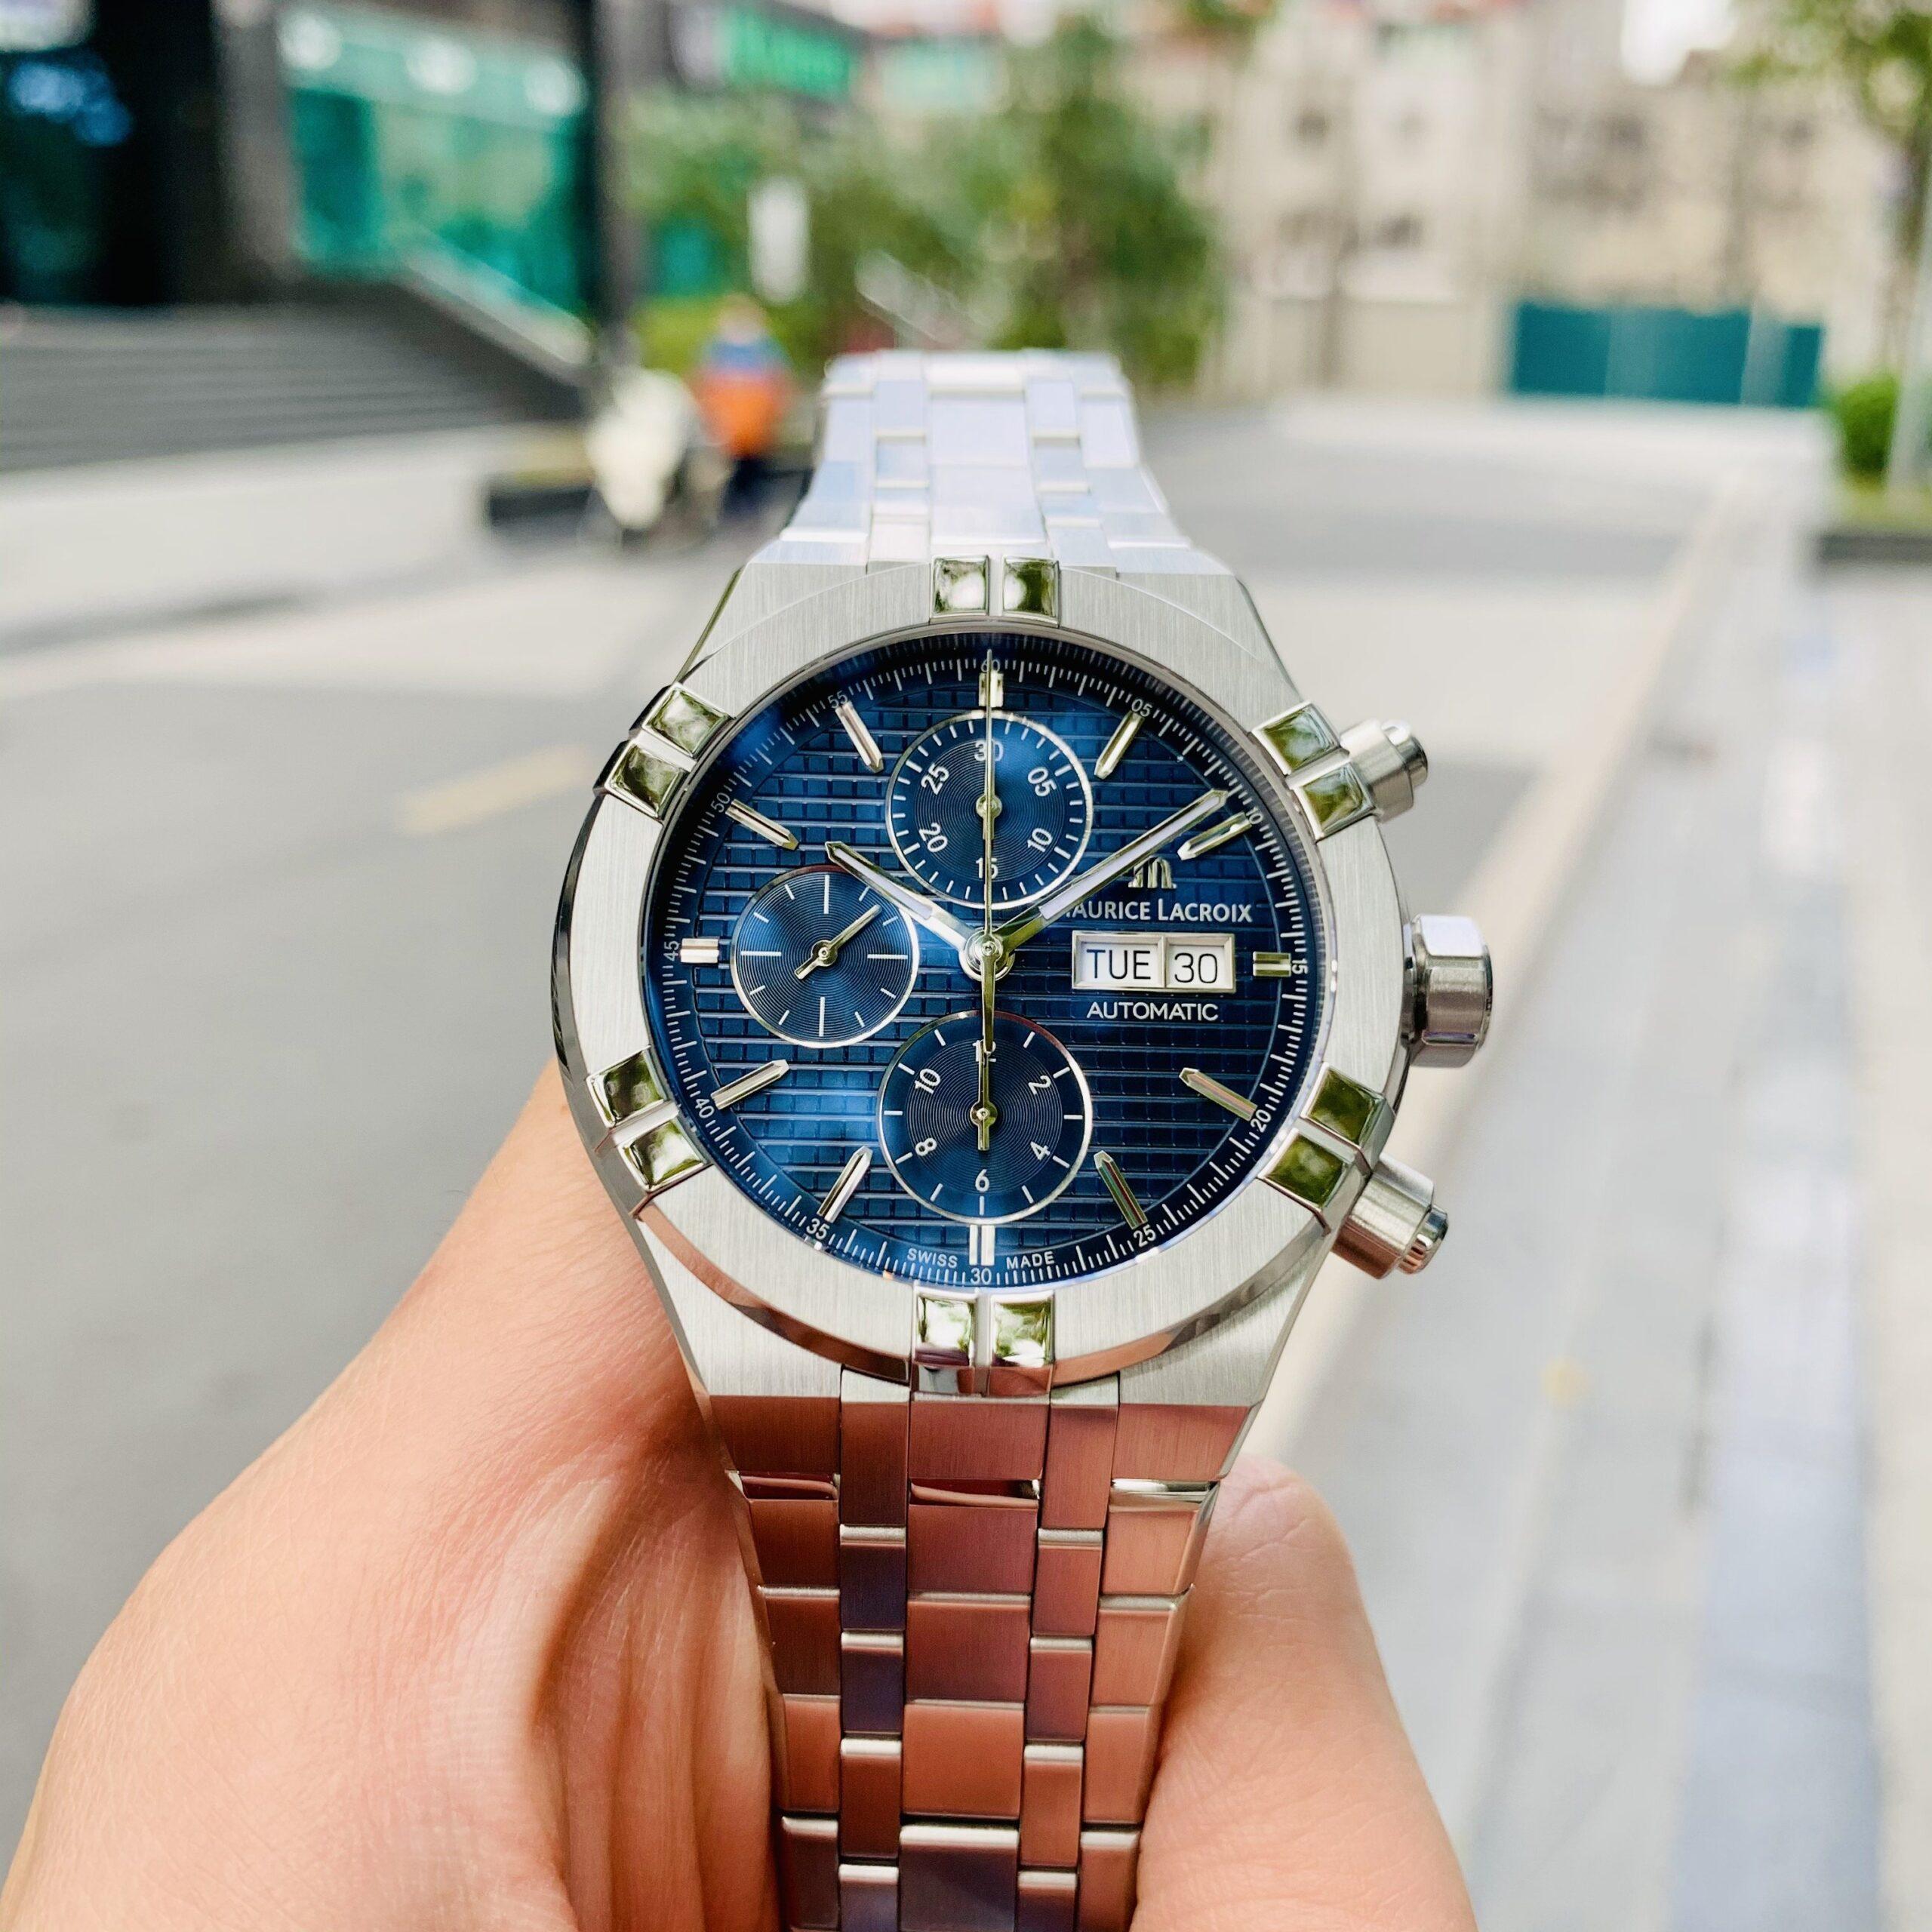 Đồng hồ Maurice Lacroix Aikon Automatic Chronograph AI6038-SS002-430-1